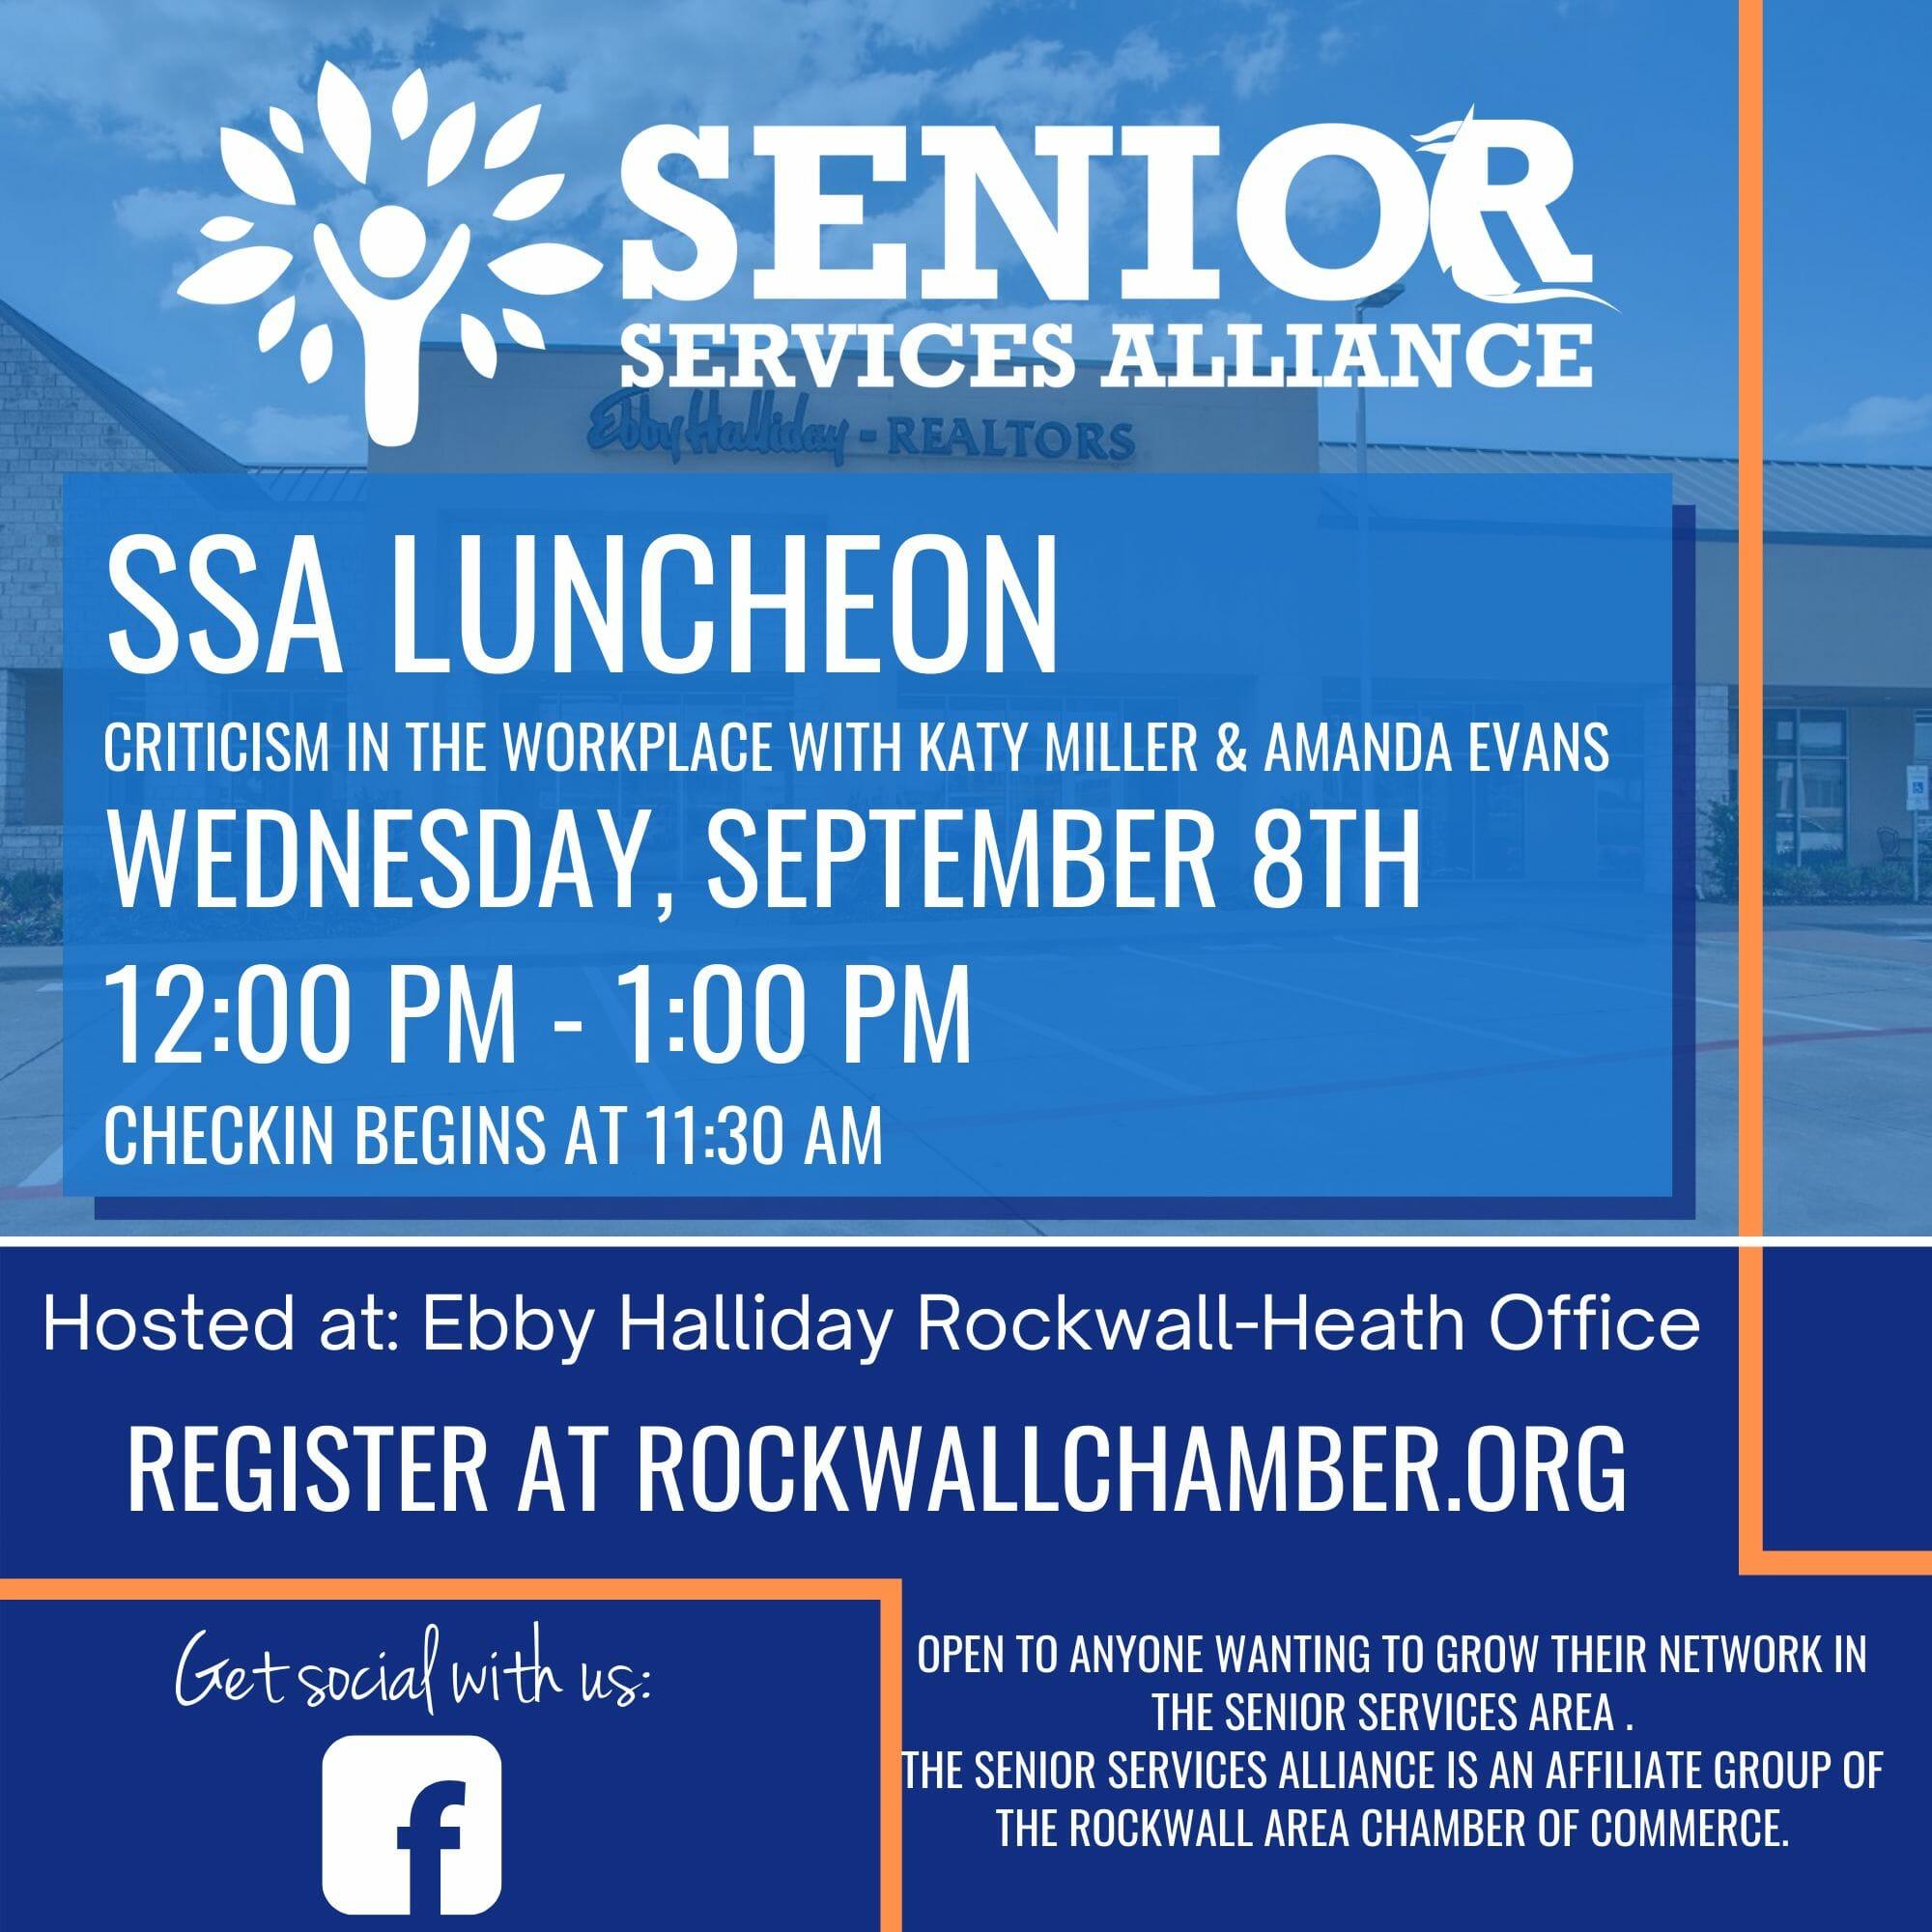 Copy of SSA Luncheon